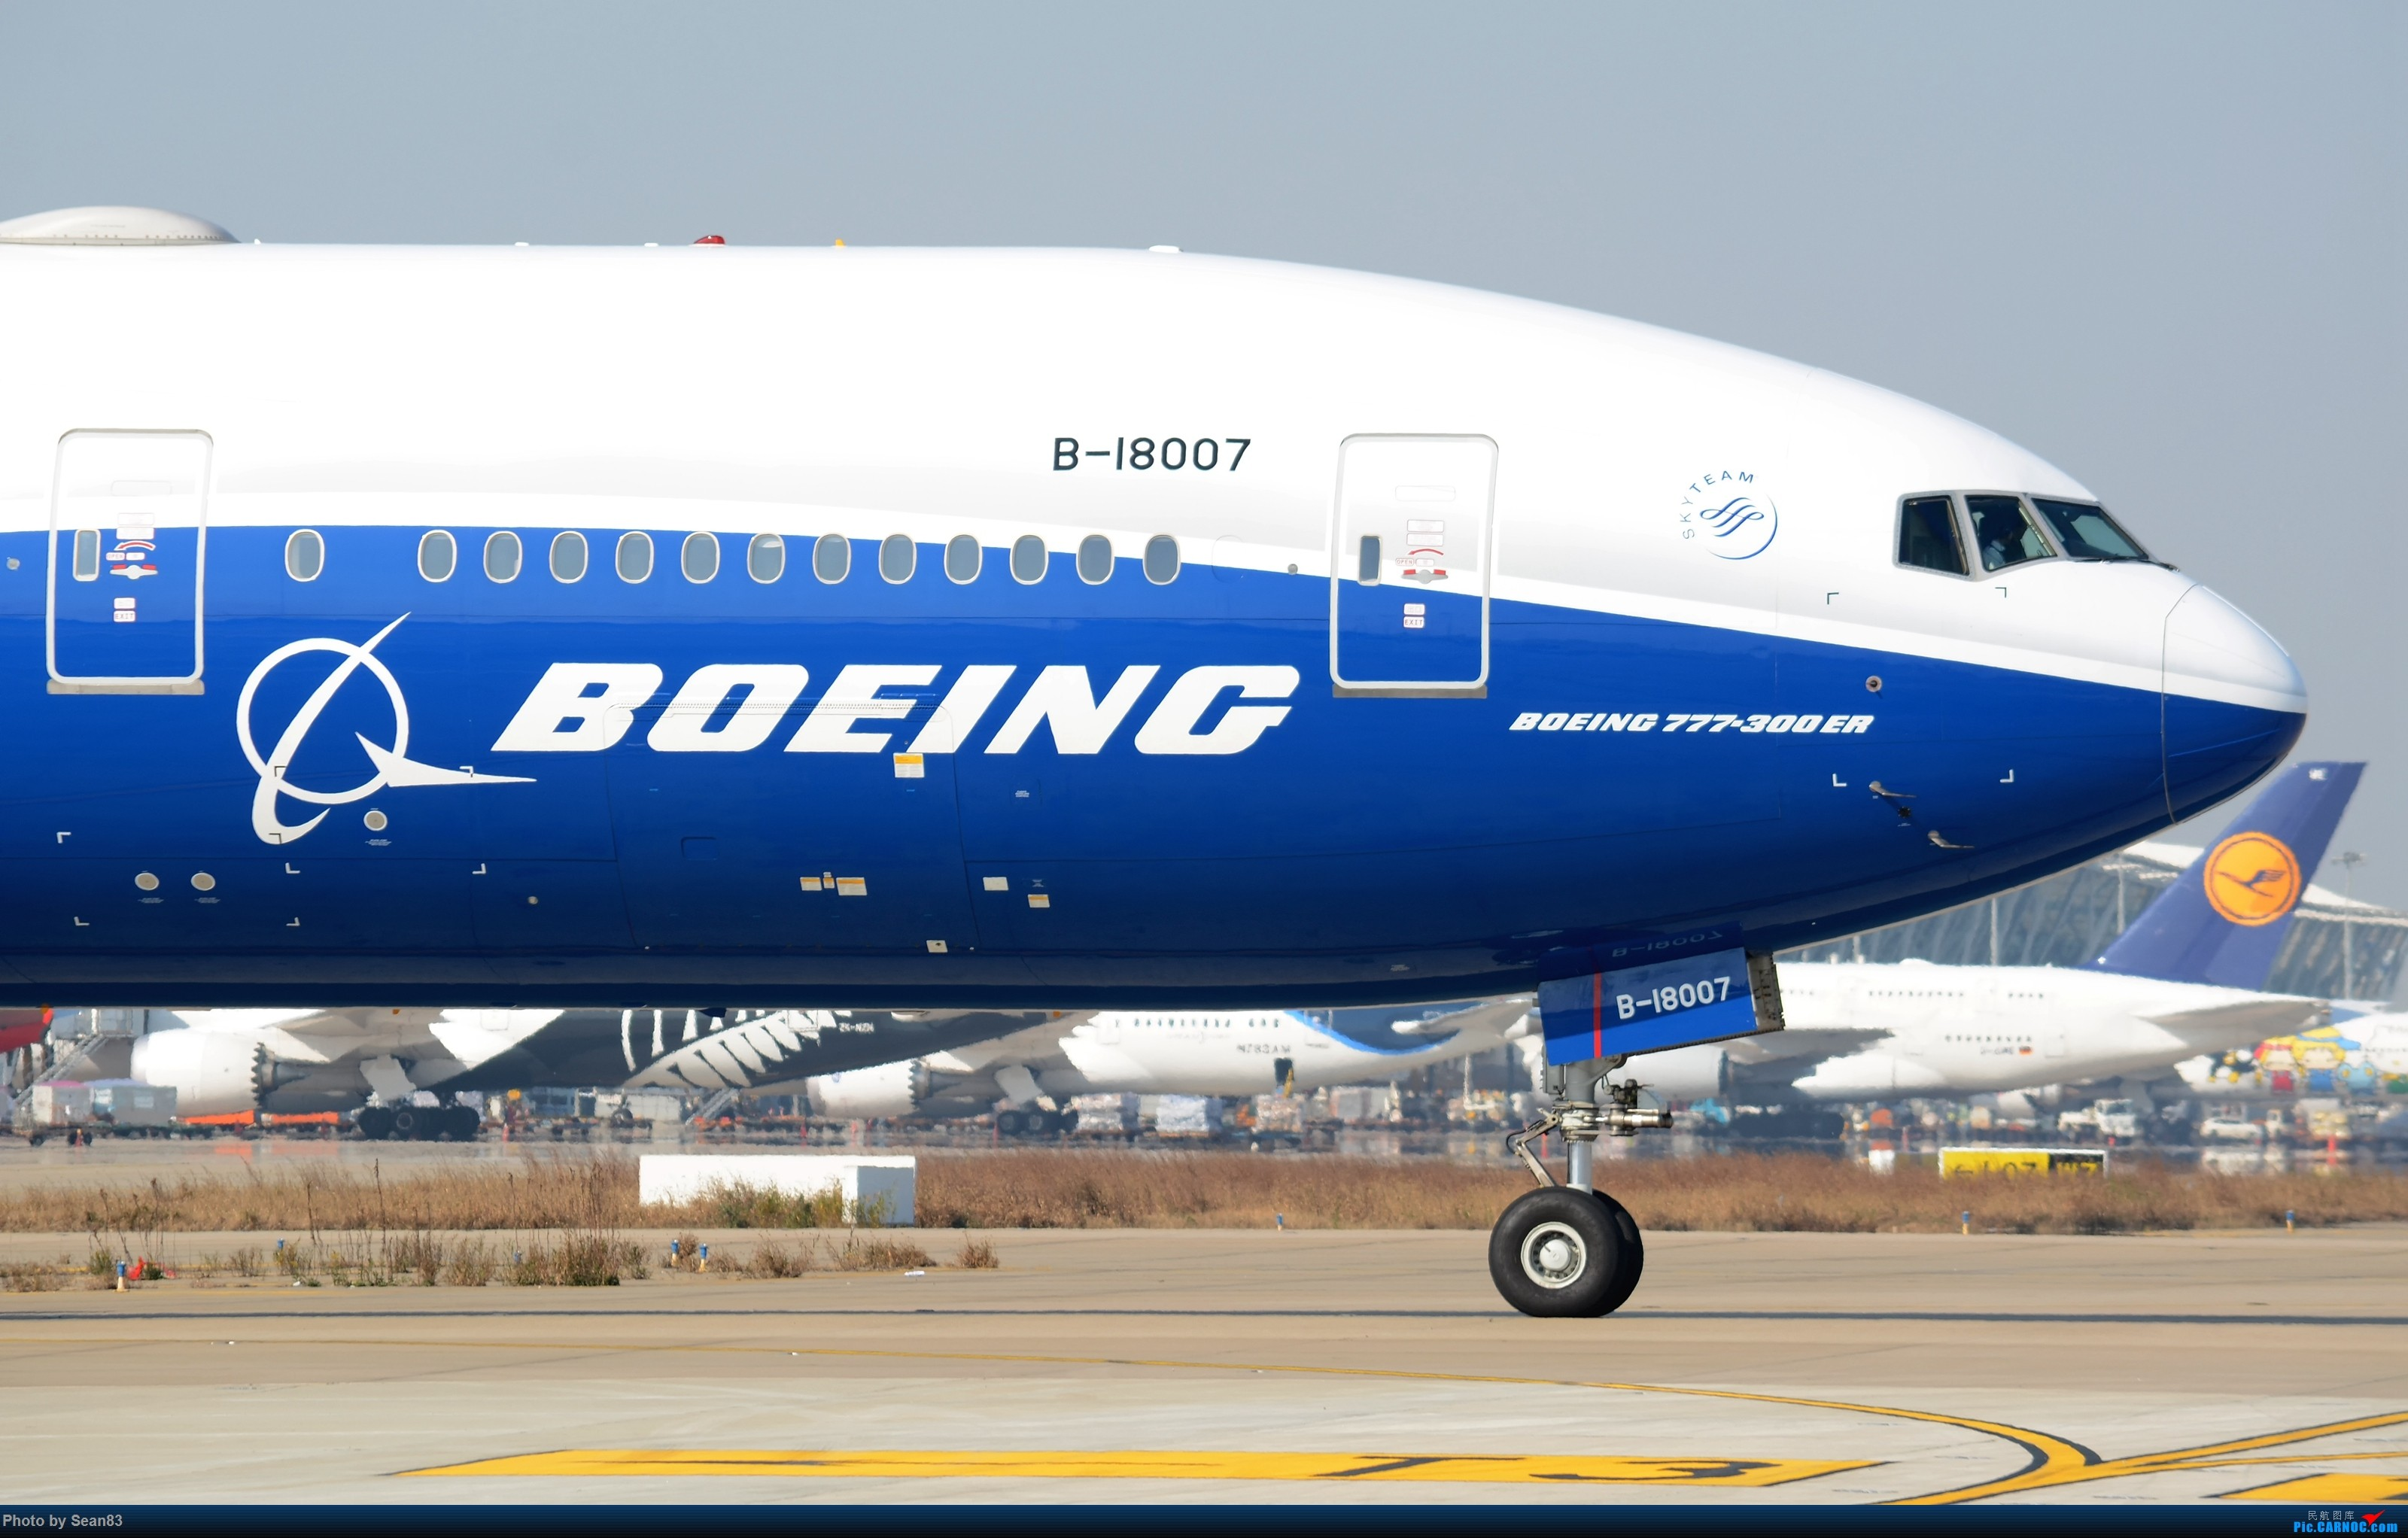 (PVG 3200*)蓝鲸大头照—幺捌洞洞拐 BOEING 777-300ER B-18007 上海浦东国际机场